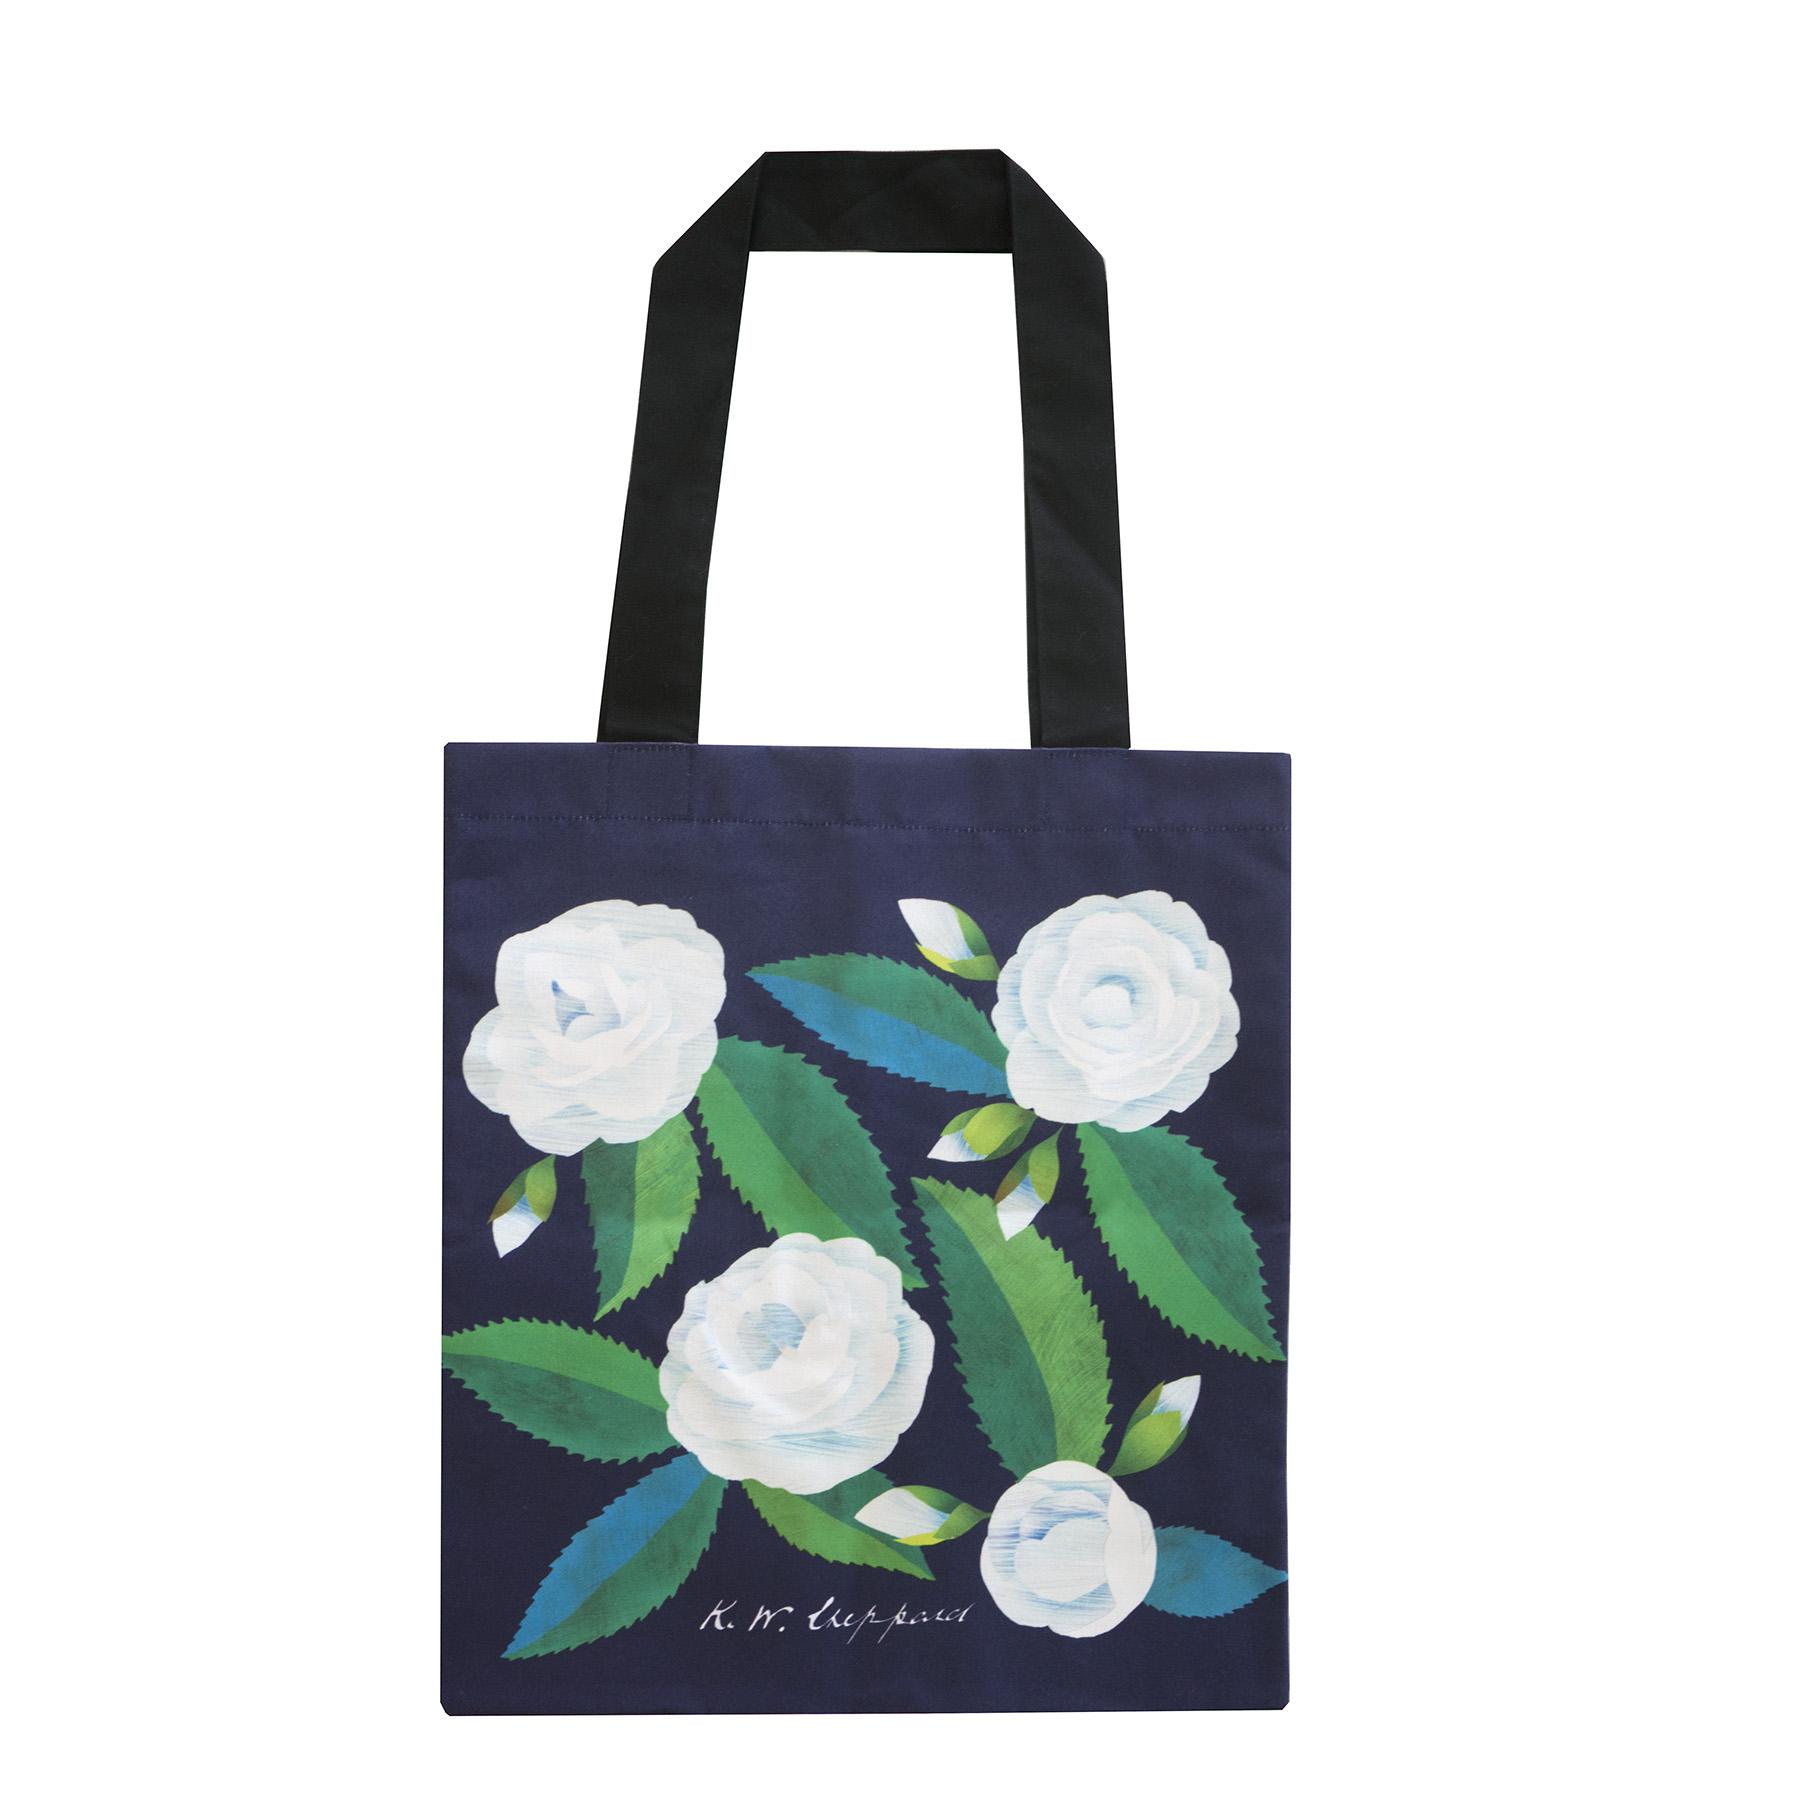 4238b44388908 Kate Sheppard Camellia Tote Bag - Museums Wellington